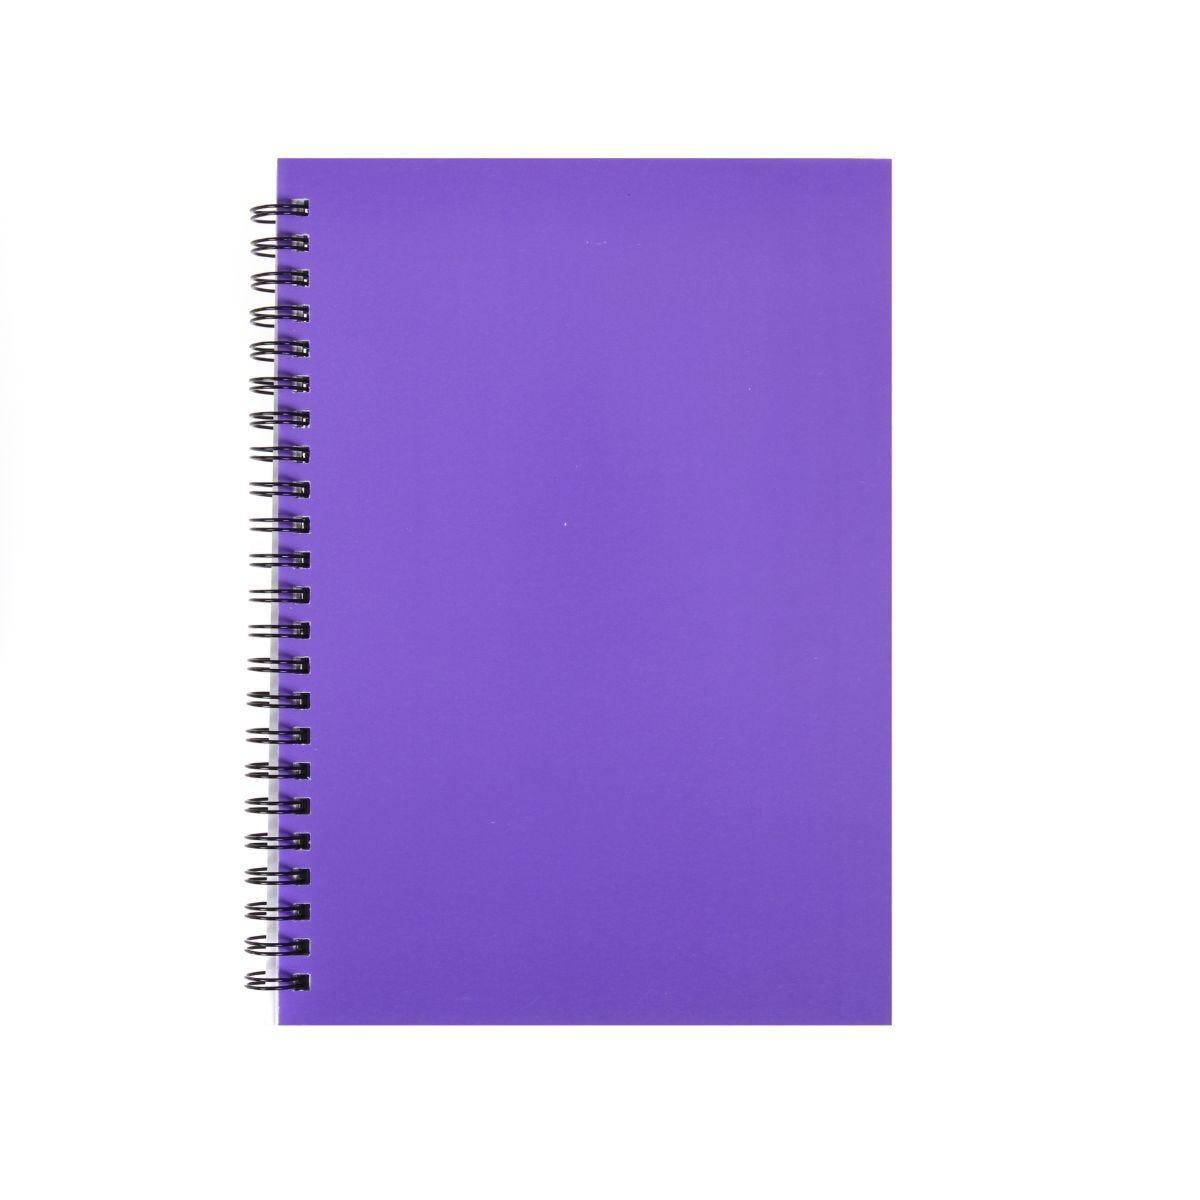 Ryman Essentials Notebooks A5 Ruled 80 Sheets Purple